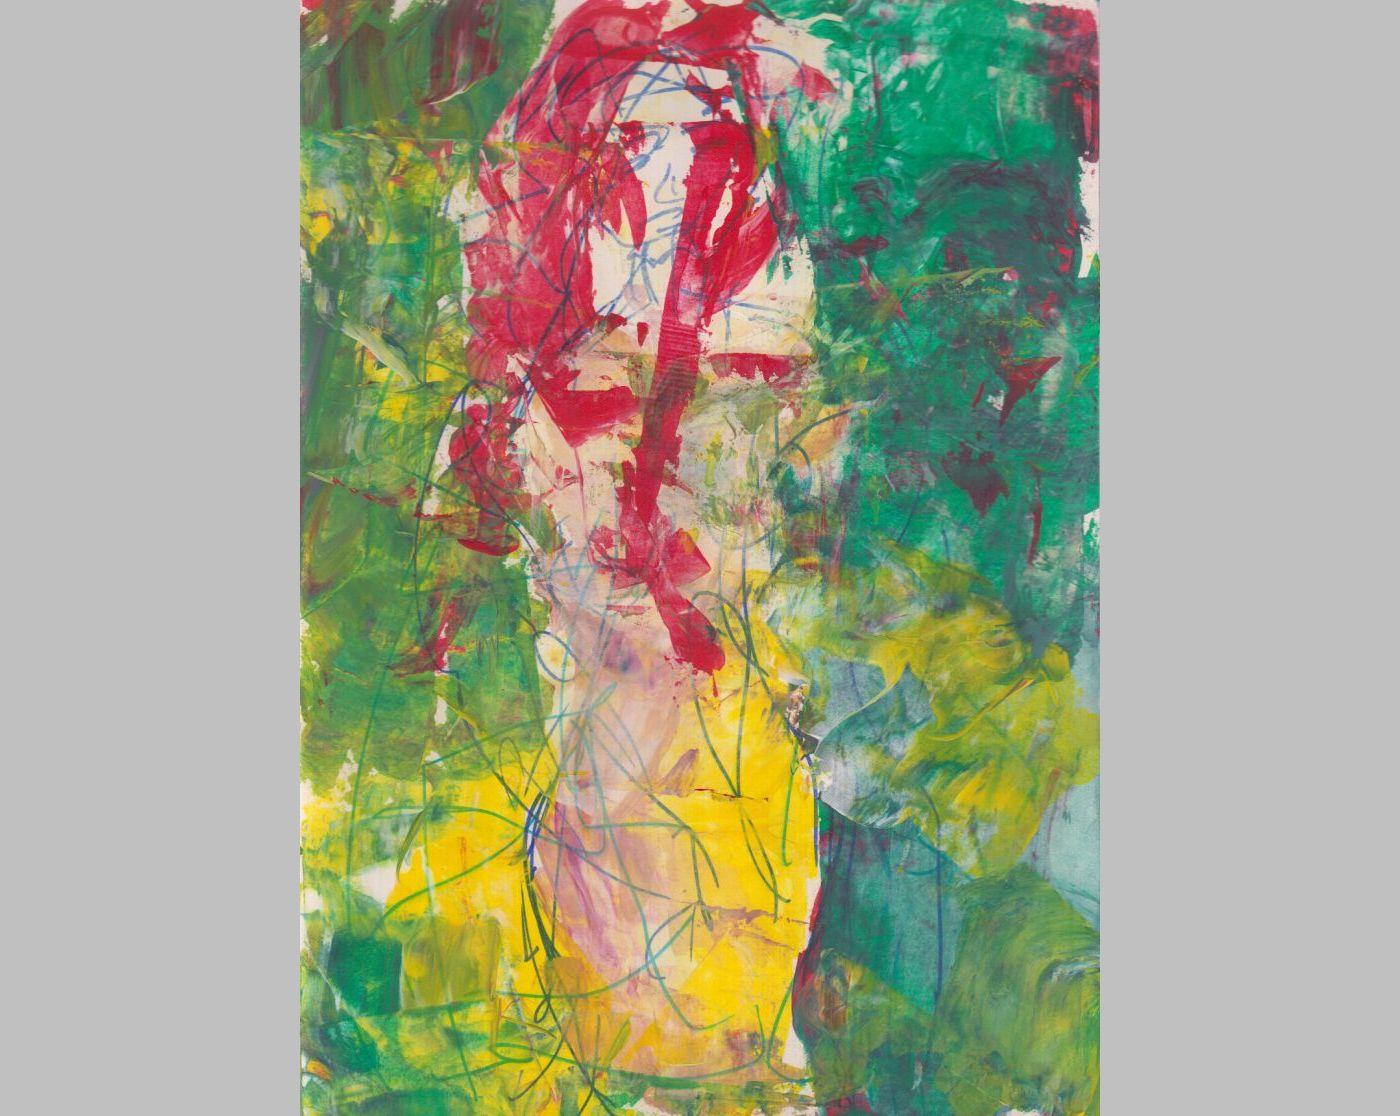 Ohne Titel (2014, 21 x 29,7 cm, A4)